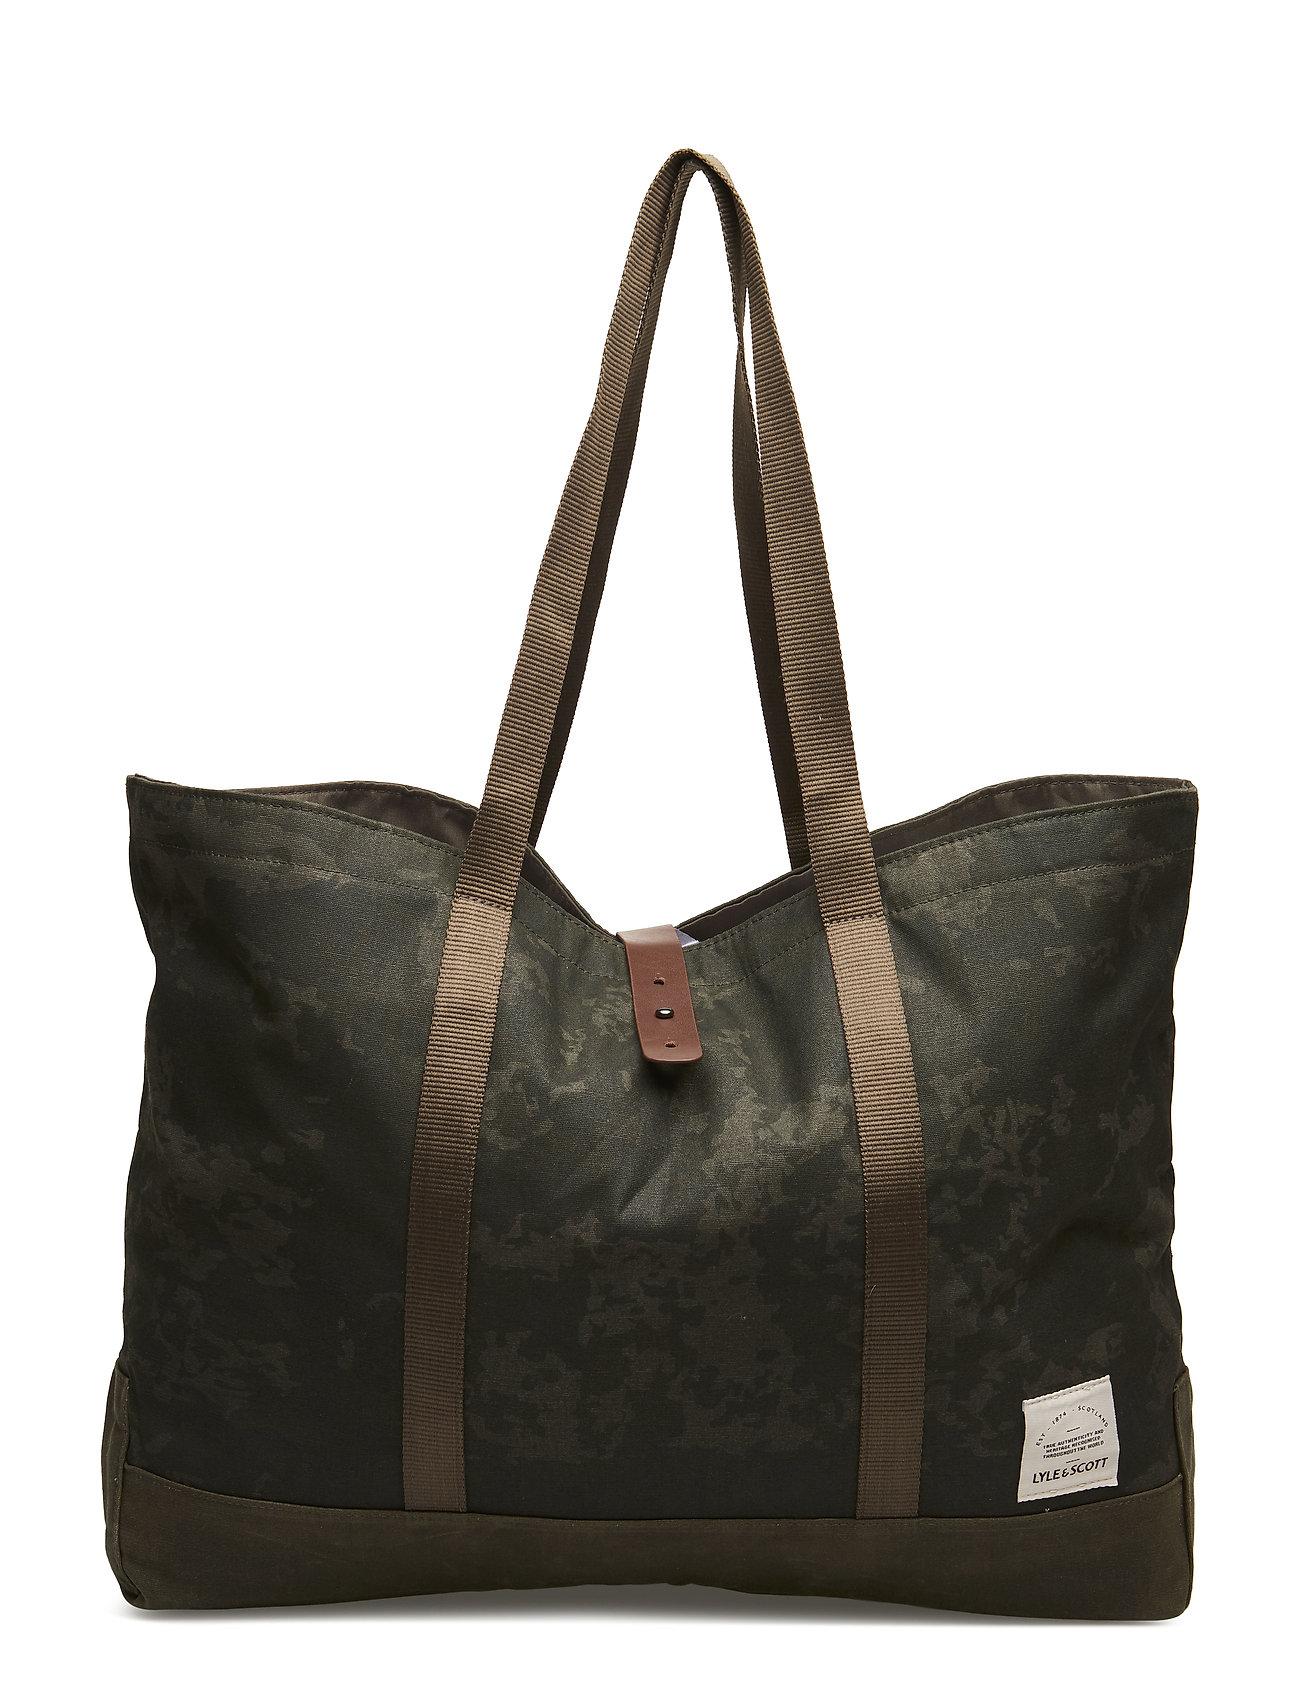 Lyle & Scott Tote Bag - DARK SAGE PRINT